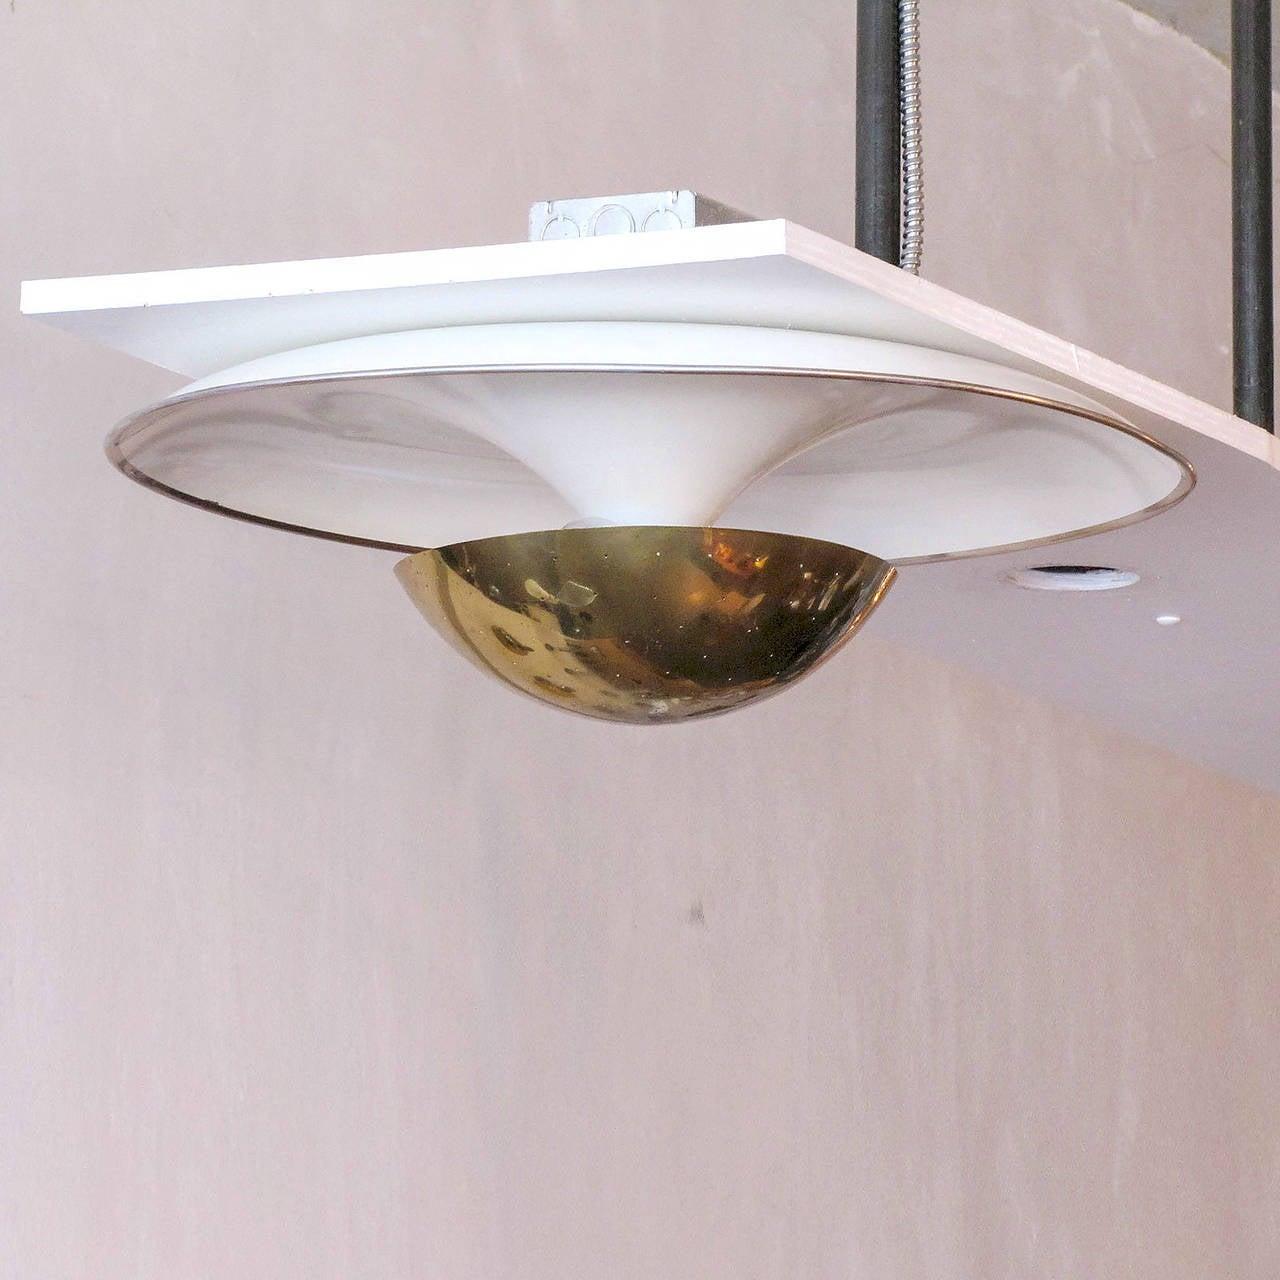 Wonderful flush mount ceiling fixture by Gino Sarfatti for Arteluce, large organically shaped ivory enameled reflector with perforated brass shade, three bulb setup.